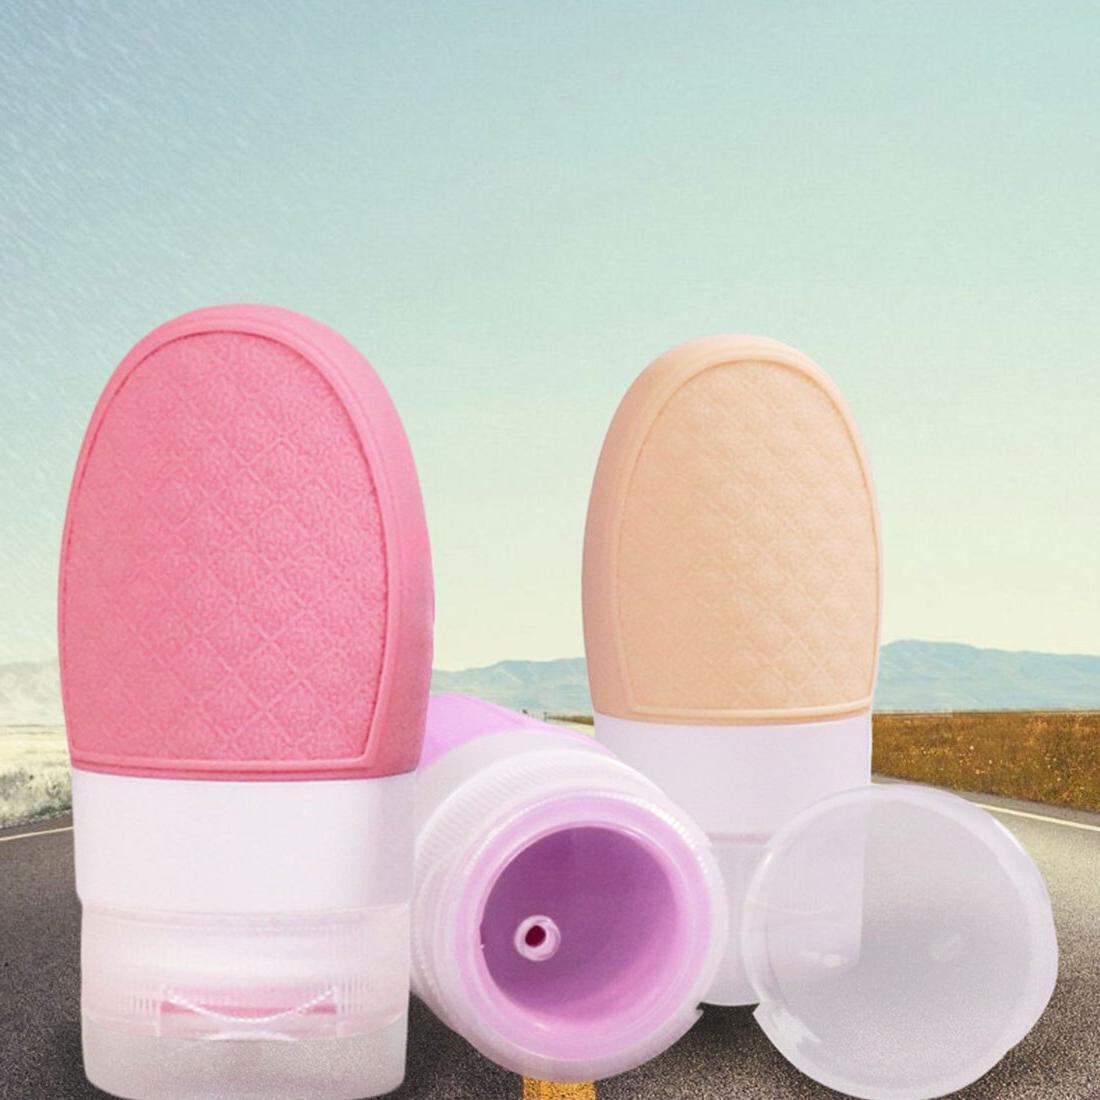 Portable lotion emulsion bottle squeeze bottle travel <font><b>gel</b></font> <font><b>hand</b></font> bottle